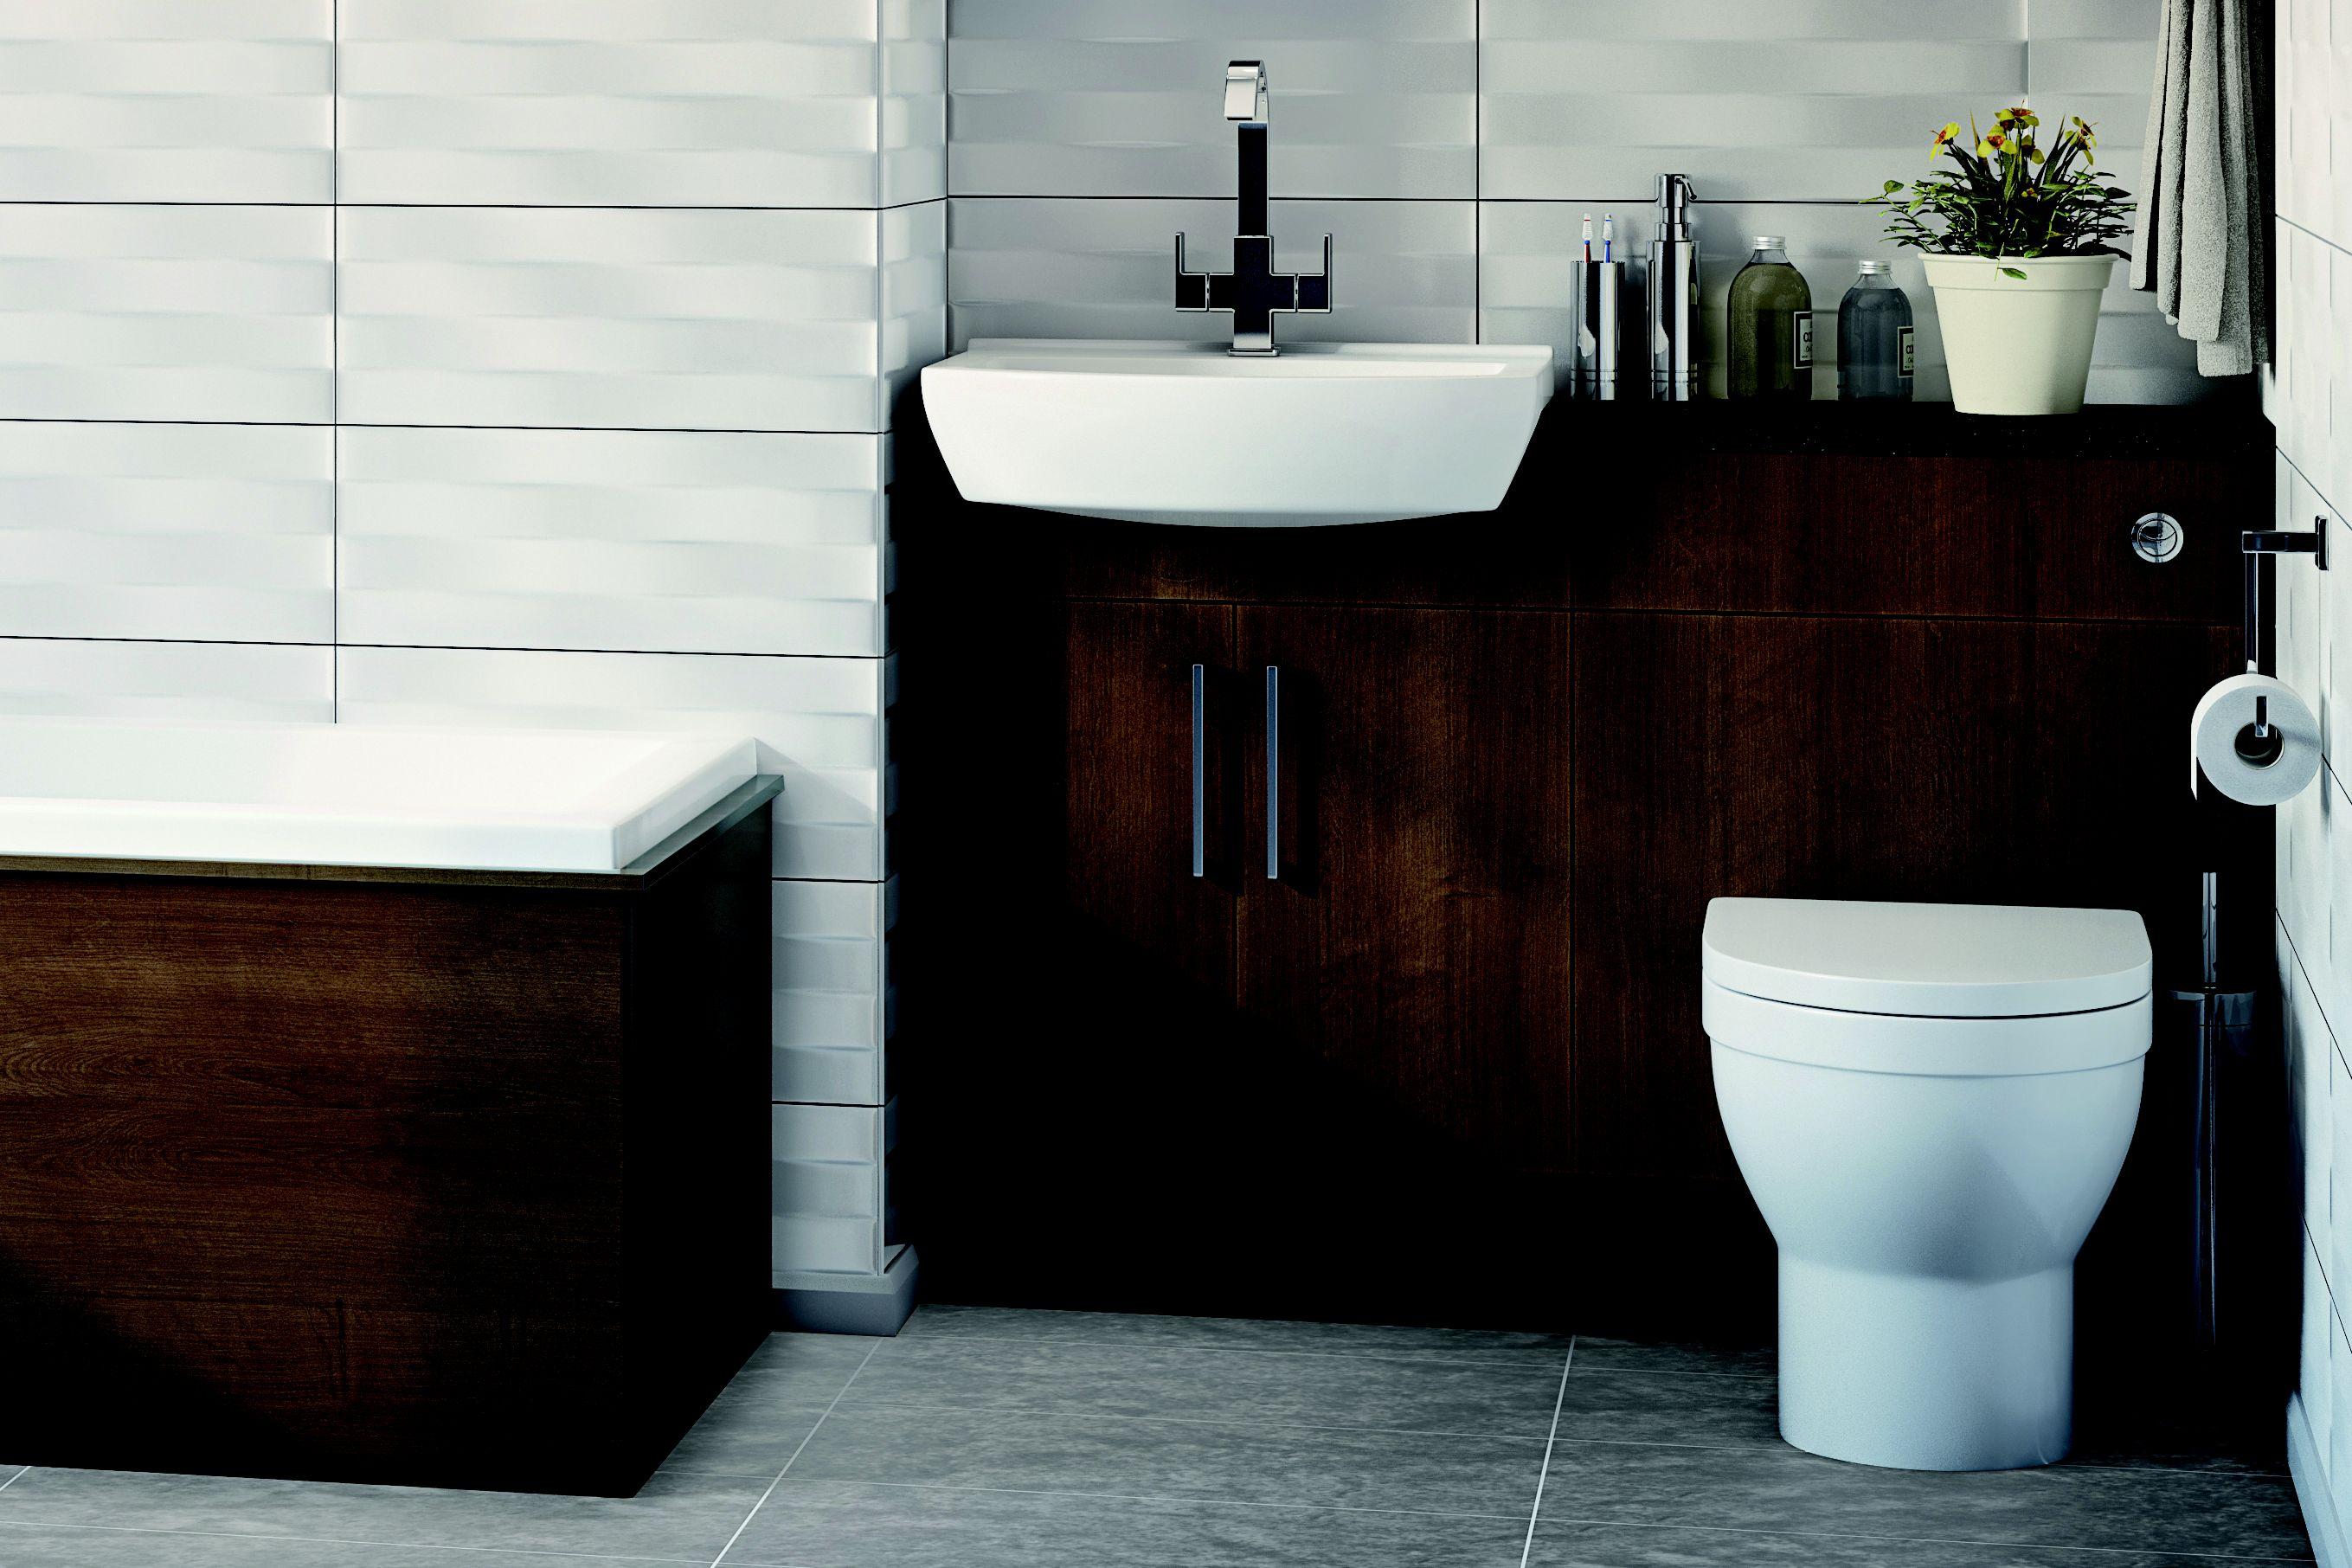 Bathroom Suites Ideas Bathroom Suites  Complete Bathroom Suites  Diy At B&q